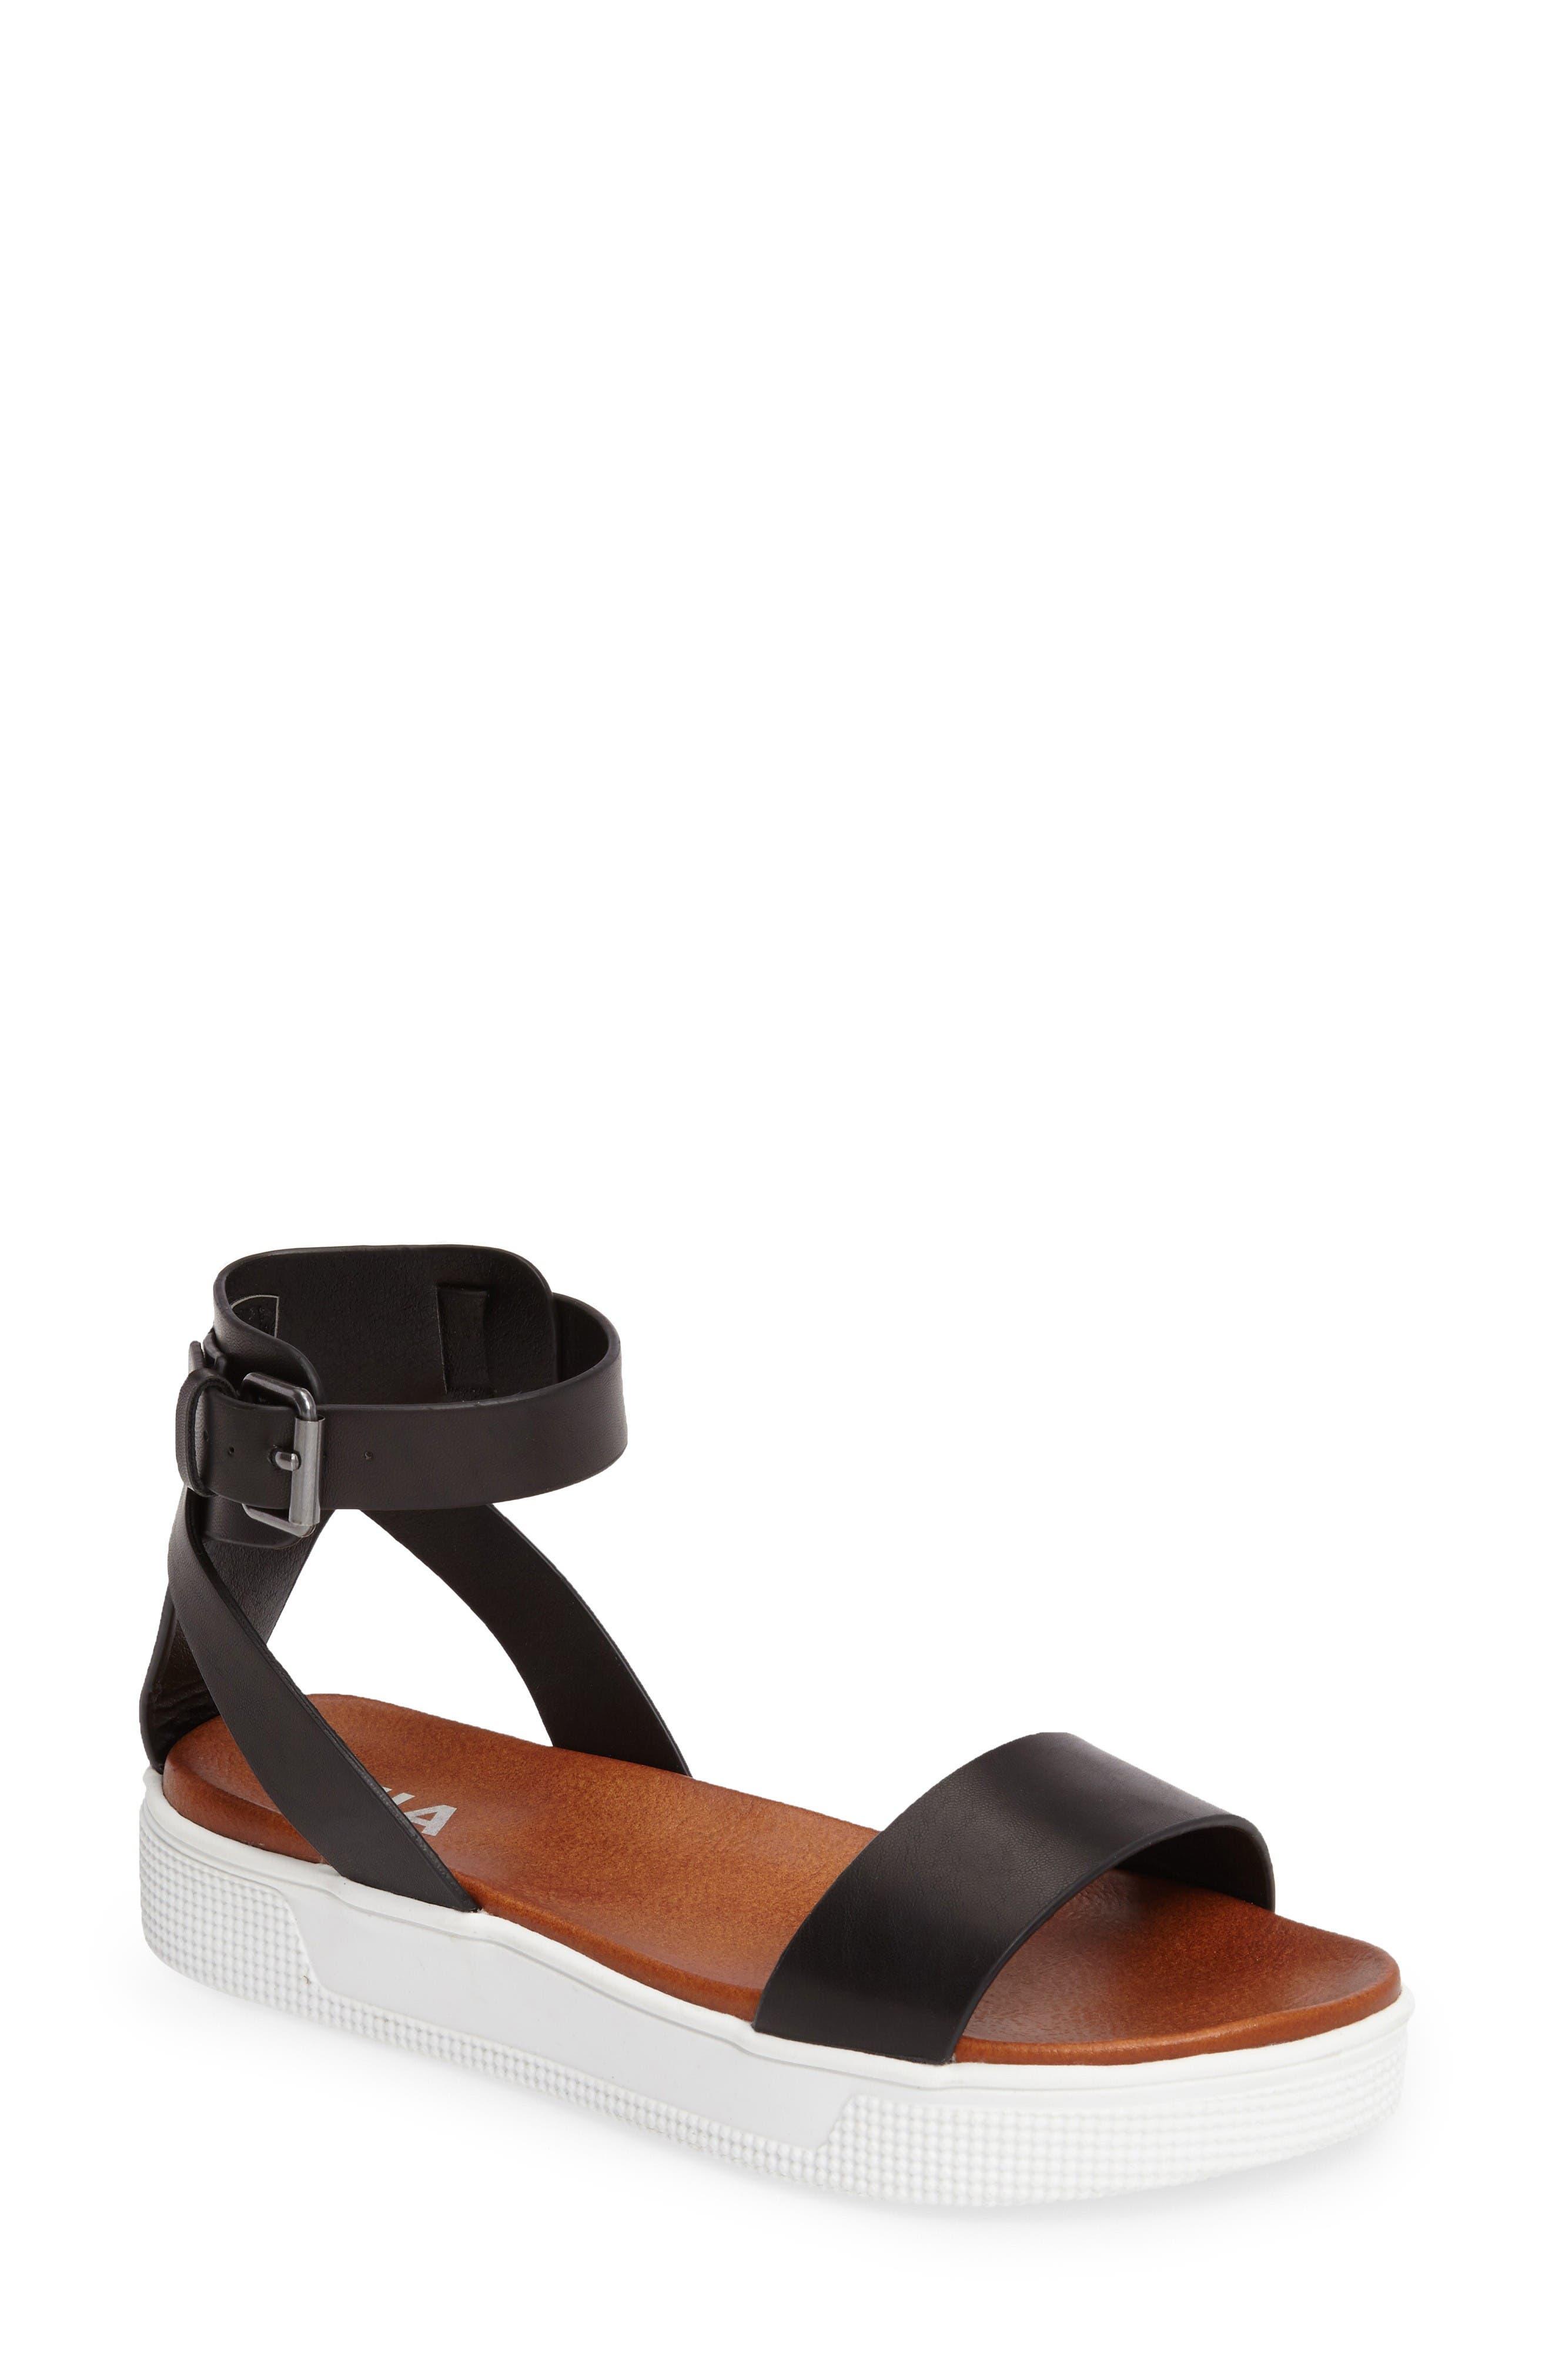 Alternate Image 1 Selected - MIA Platform Sandal (Women)